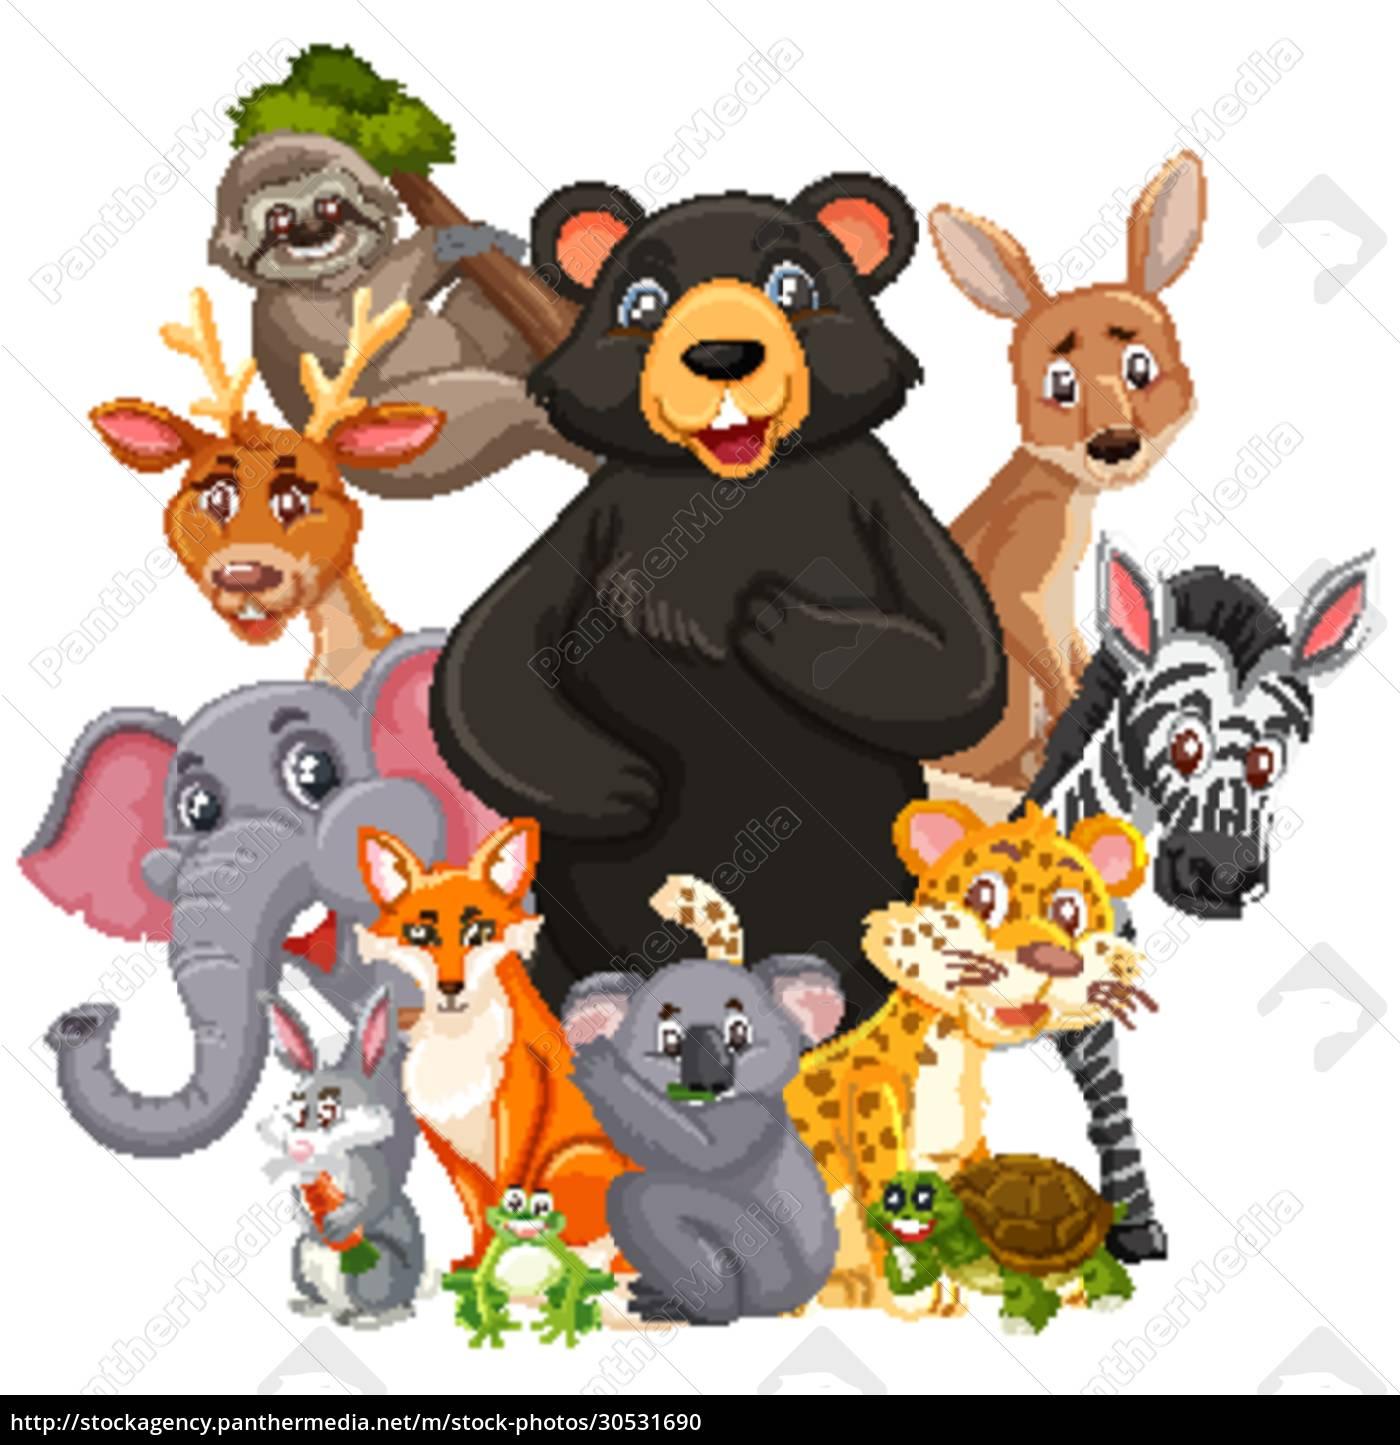 different, types, of, wild, animals, on - 30531690